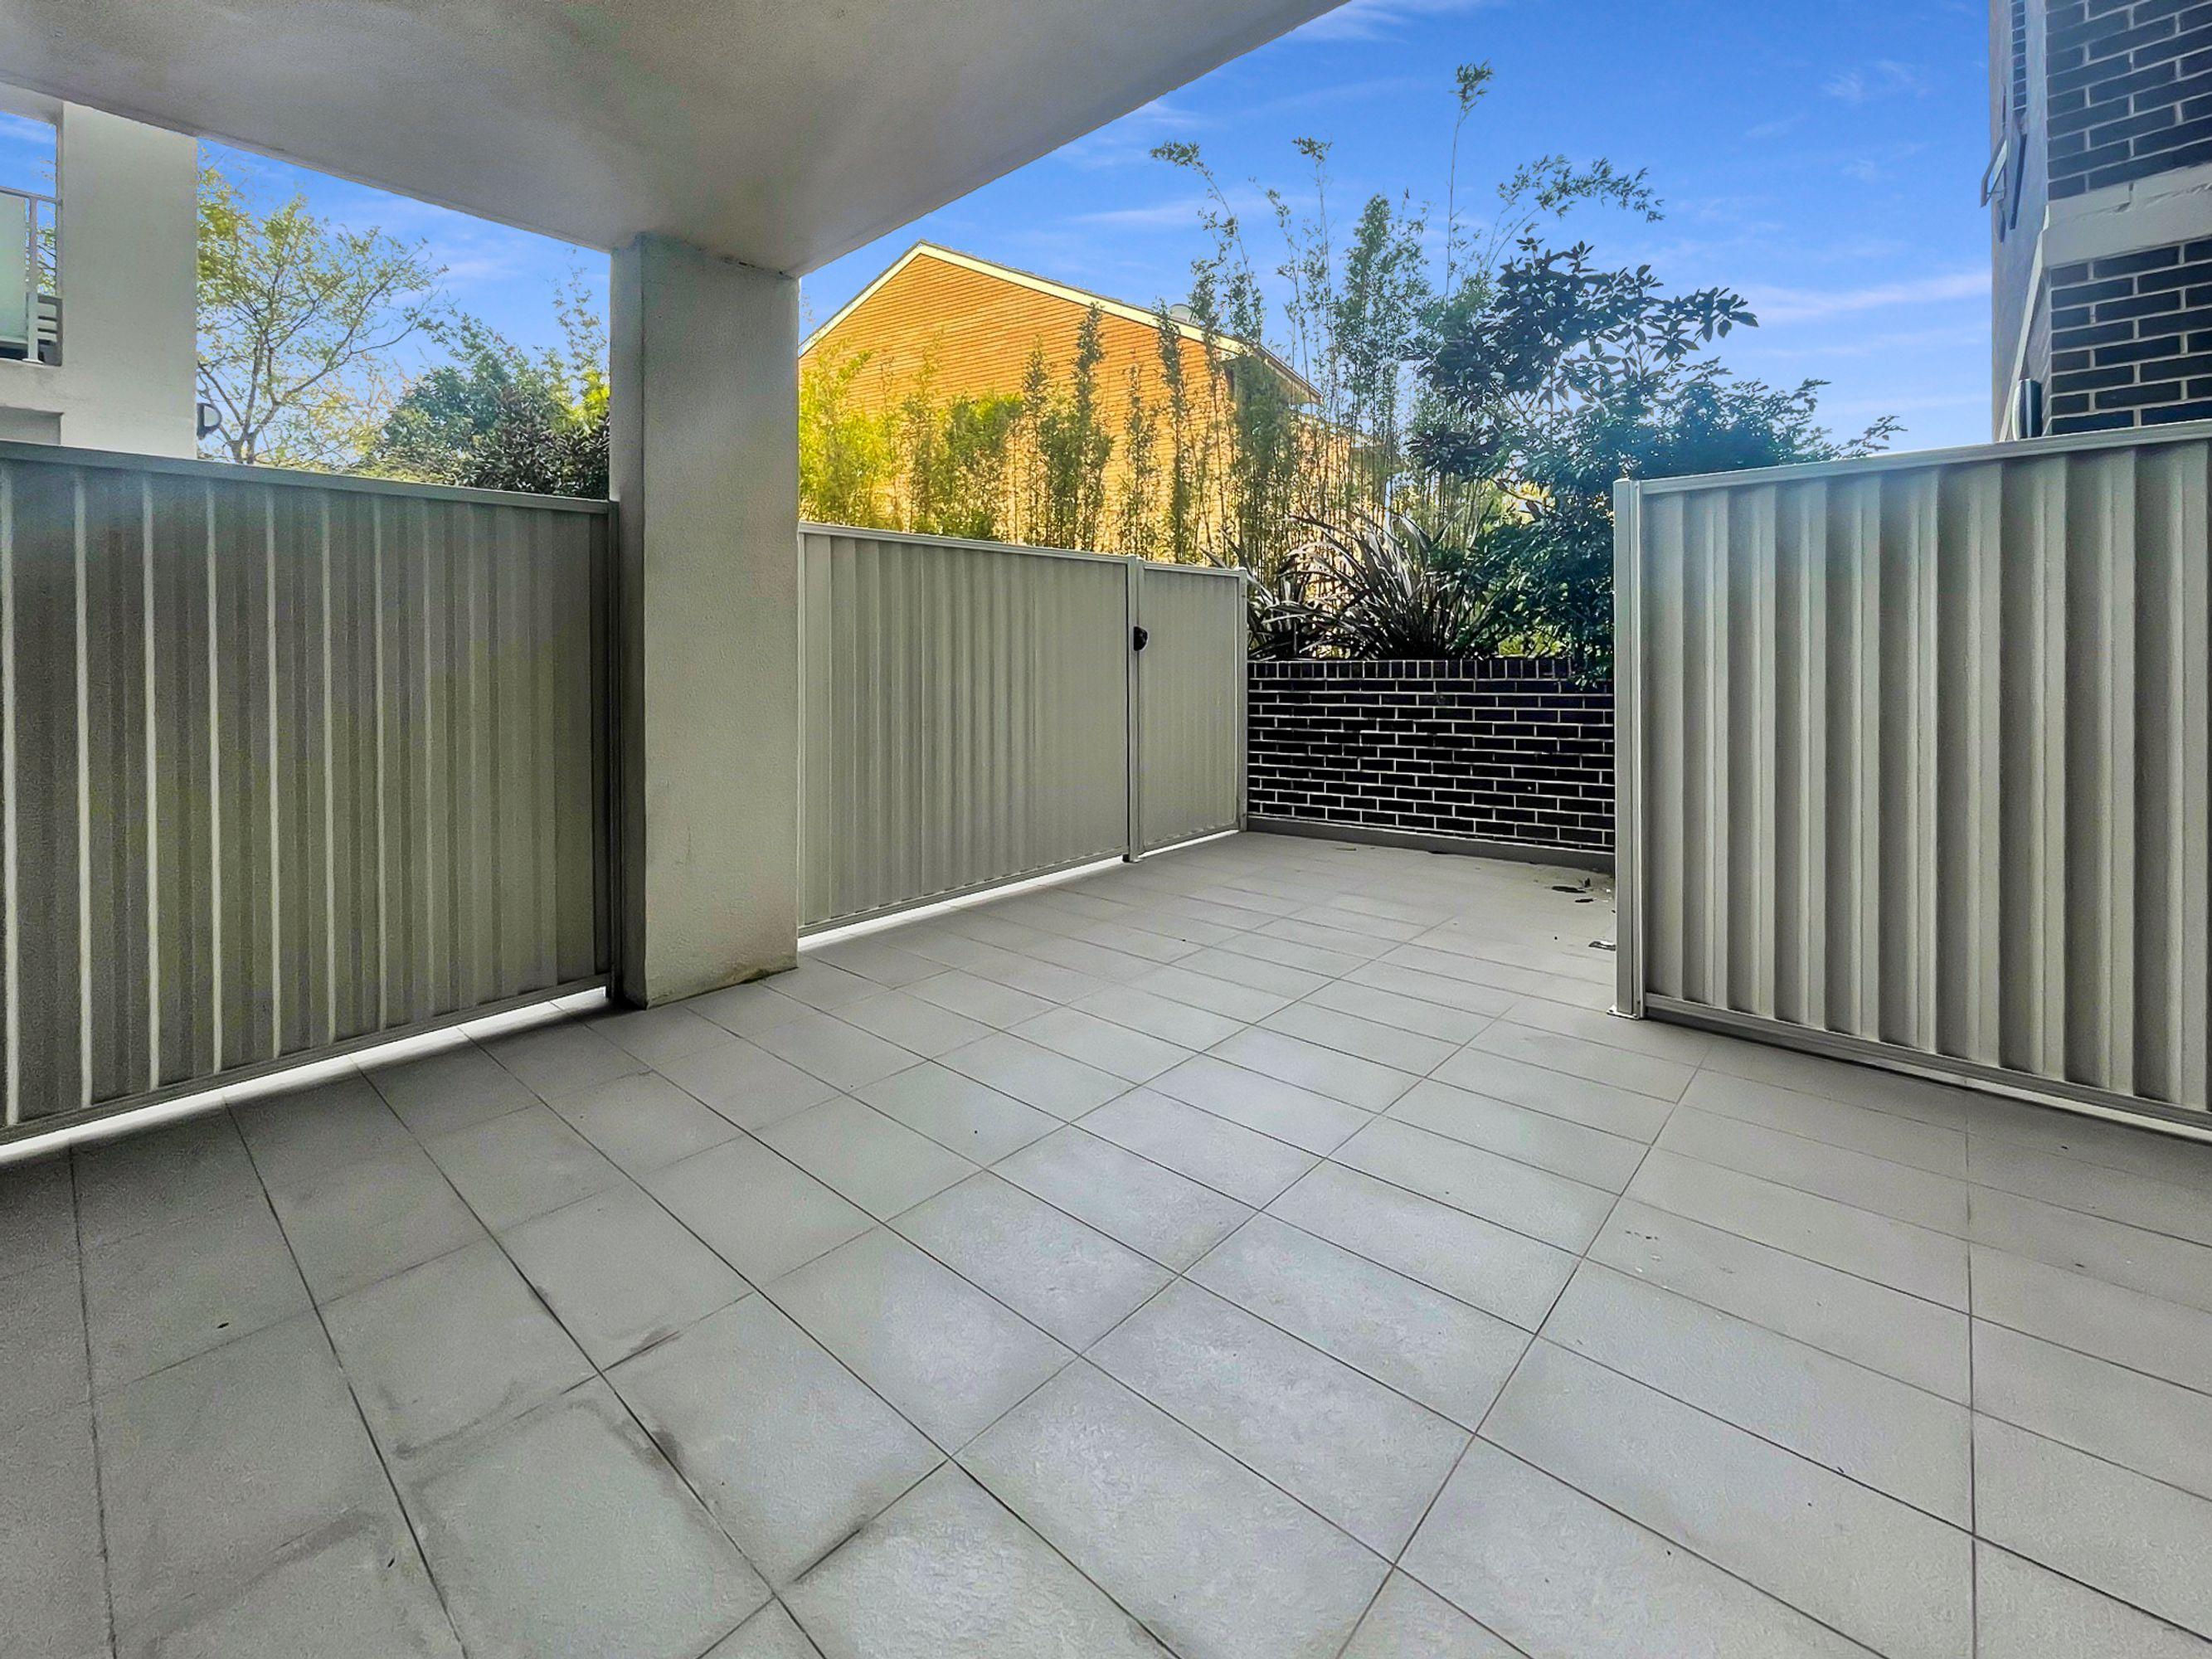 3/120 Victoria Road, Gladesville, NSW 2111